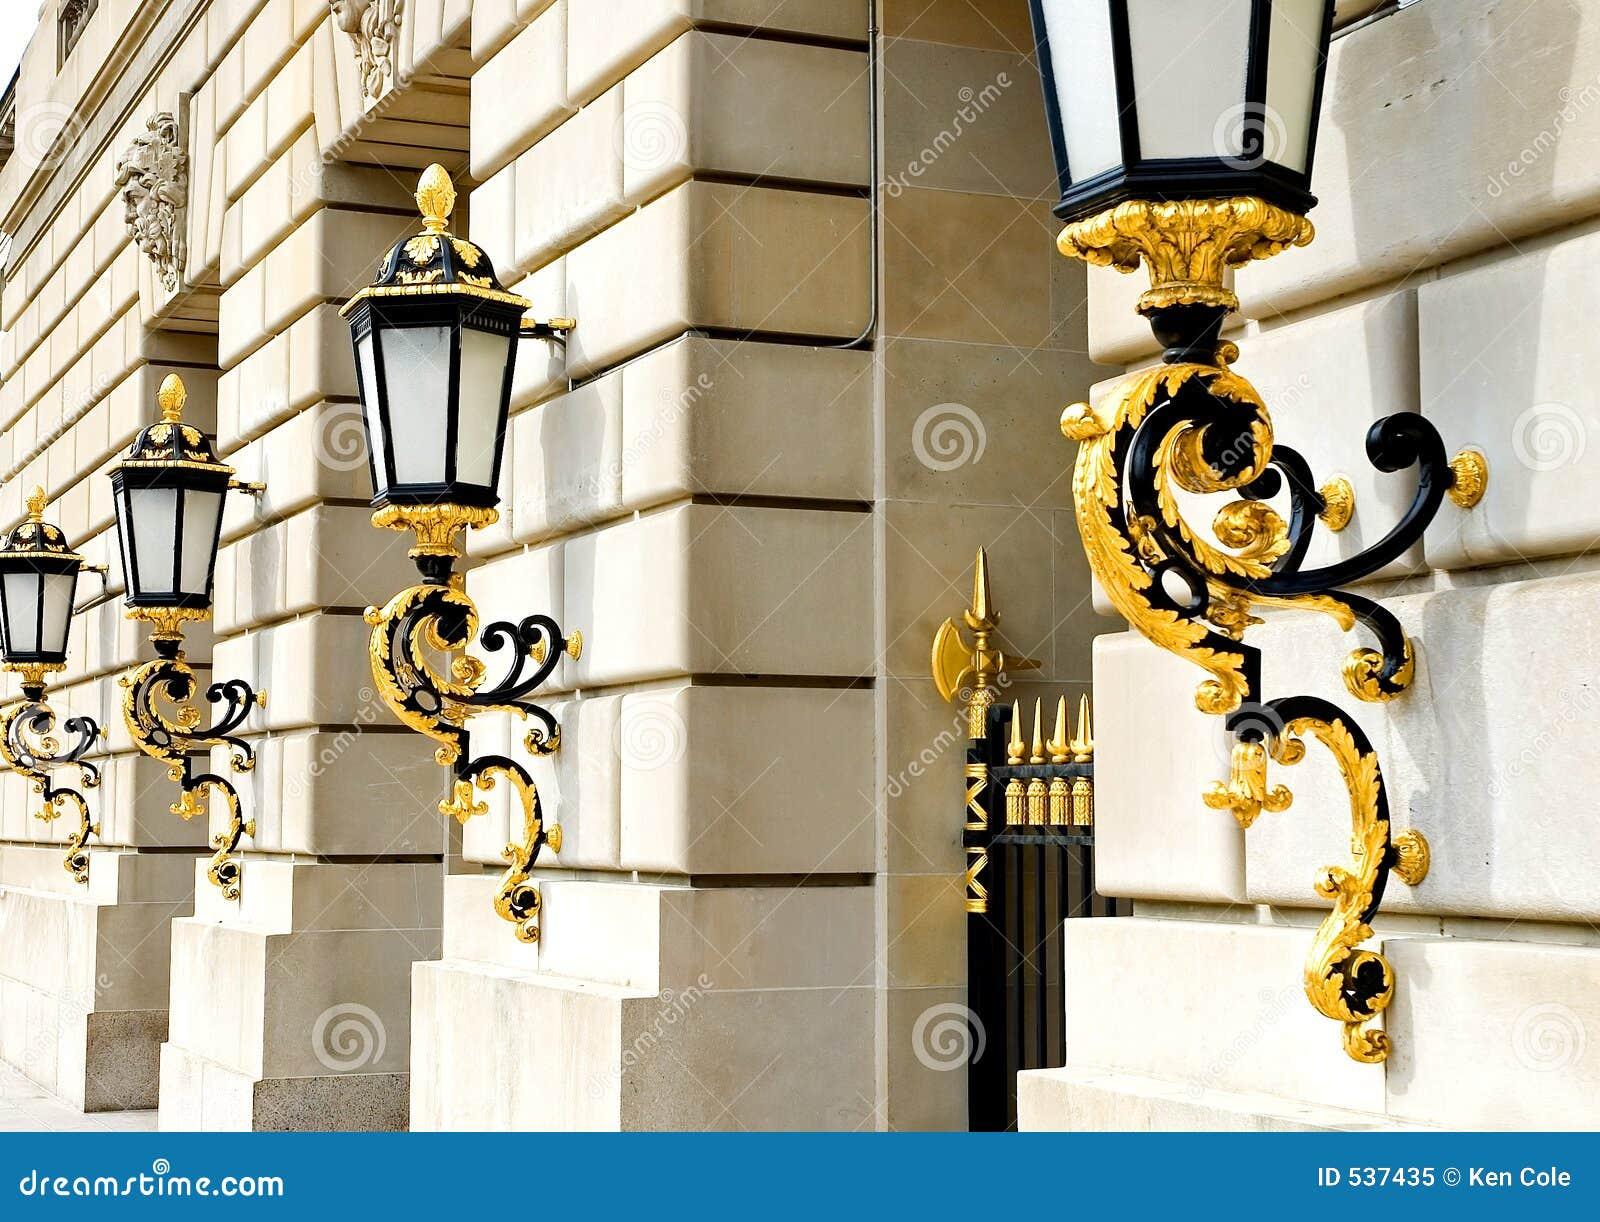 Download 金黄灯笼 库存图片. 图片 包括有 装饰, beautifuler, 照亮, 夹具, 进入, 布琼布拉, 典雅 - 537435